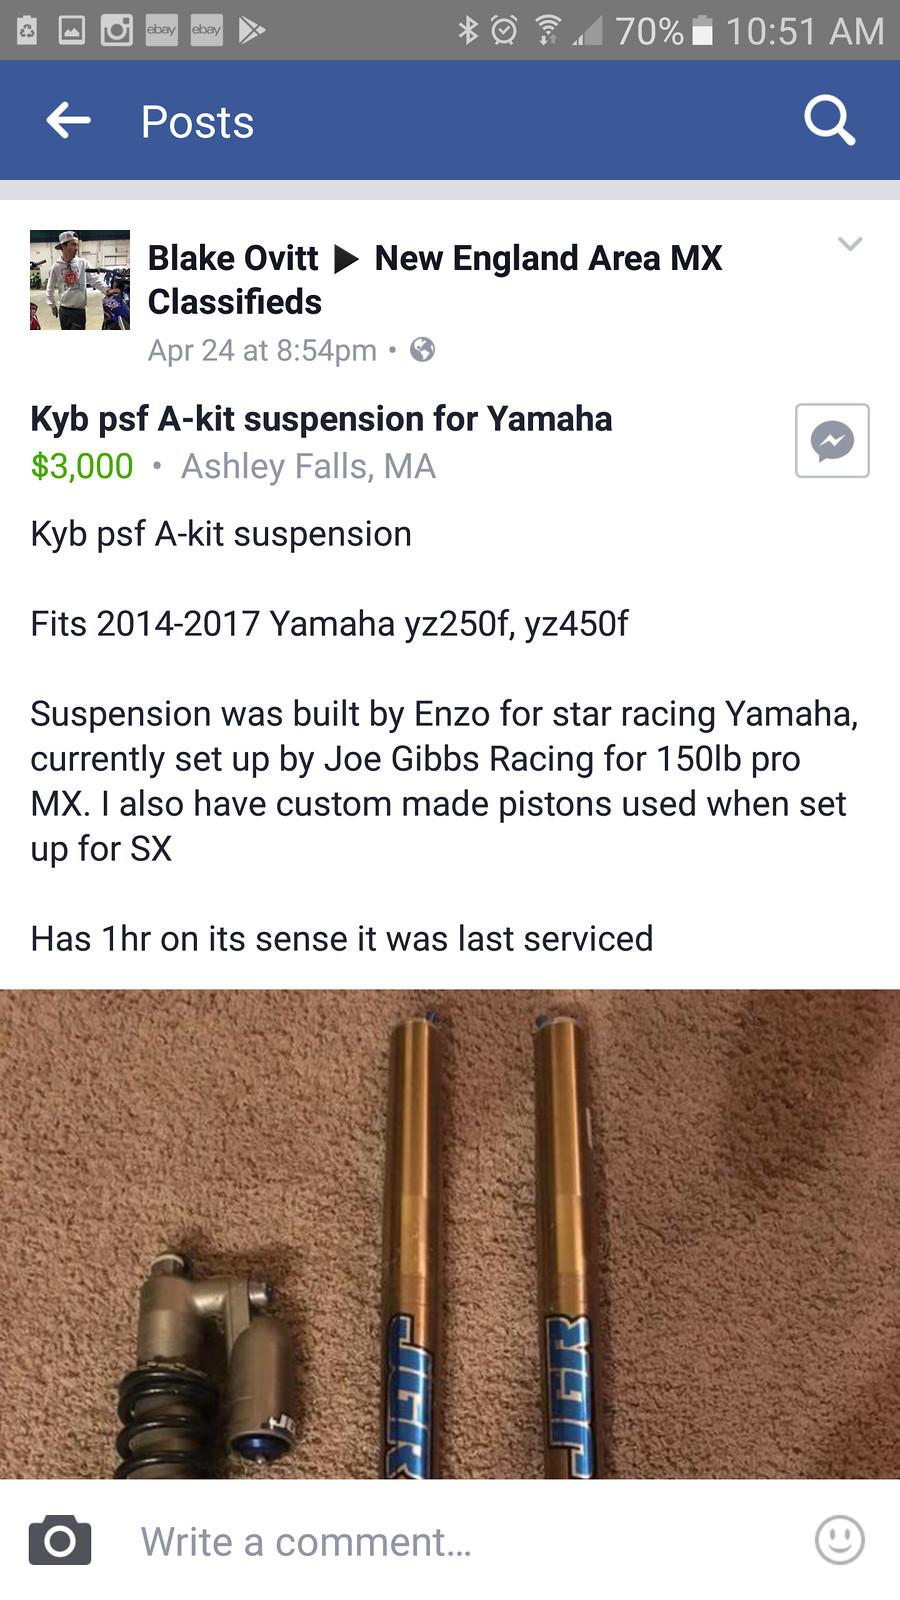 ISO: 2016 YZ450F Suspension - For Sale/Bazaar - Motocross Forums